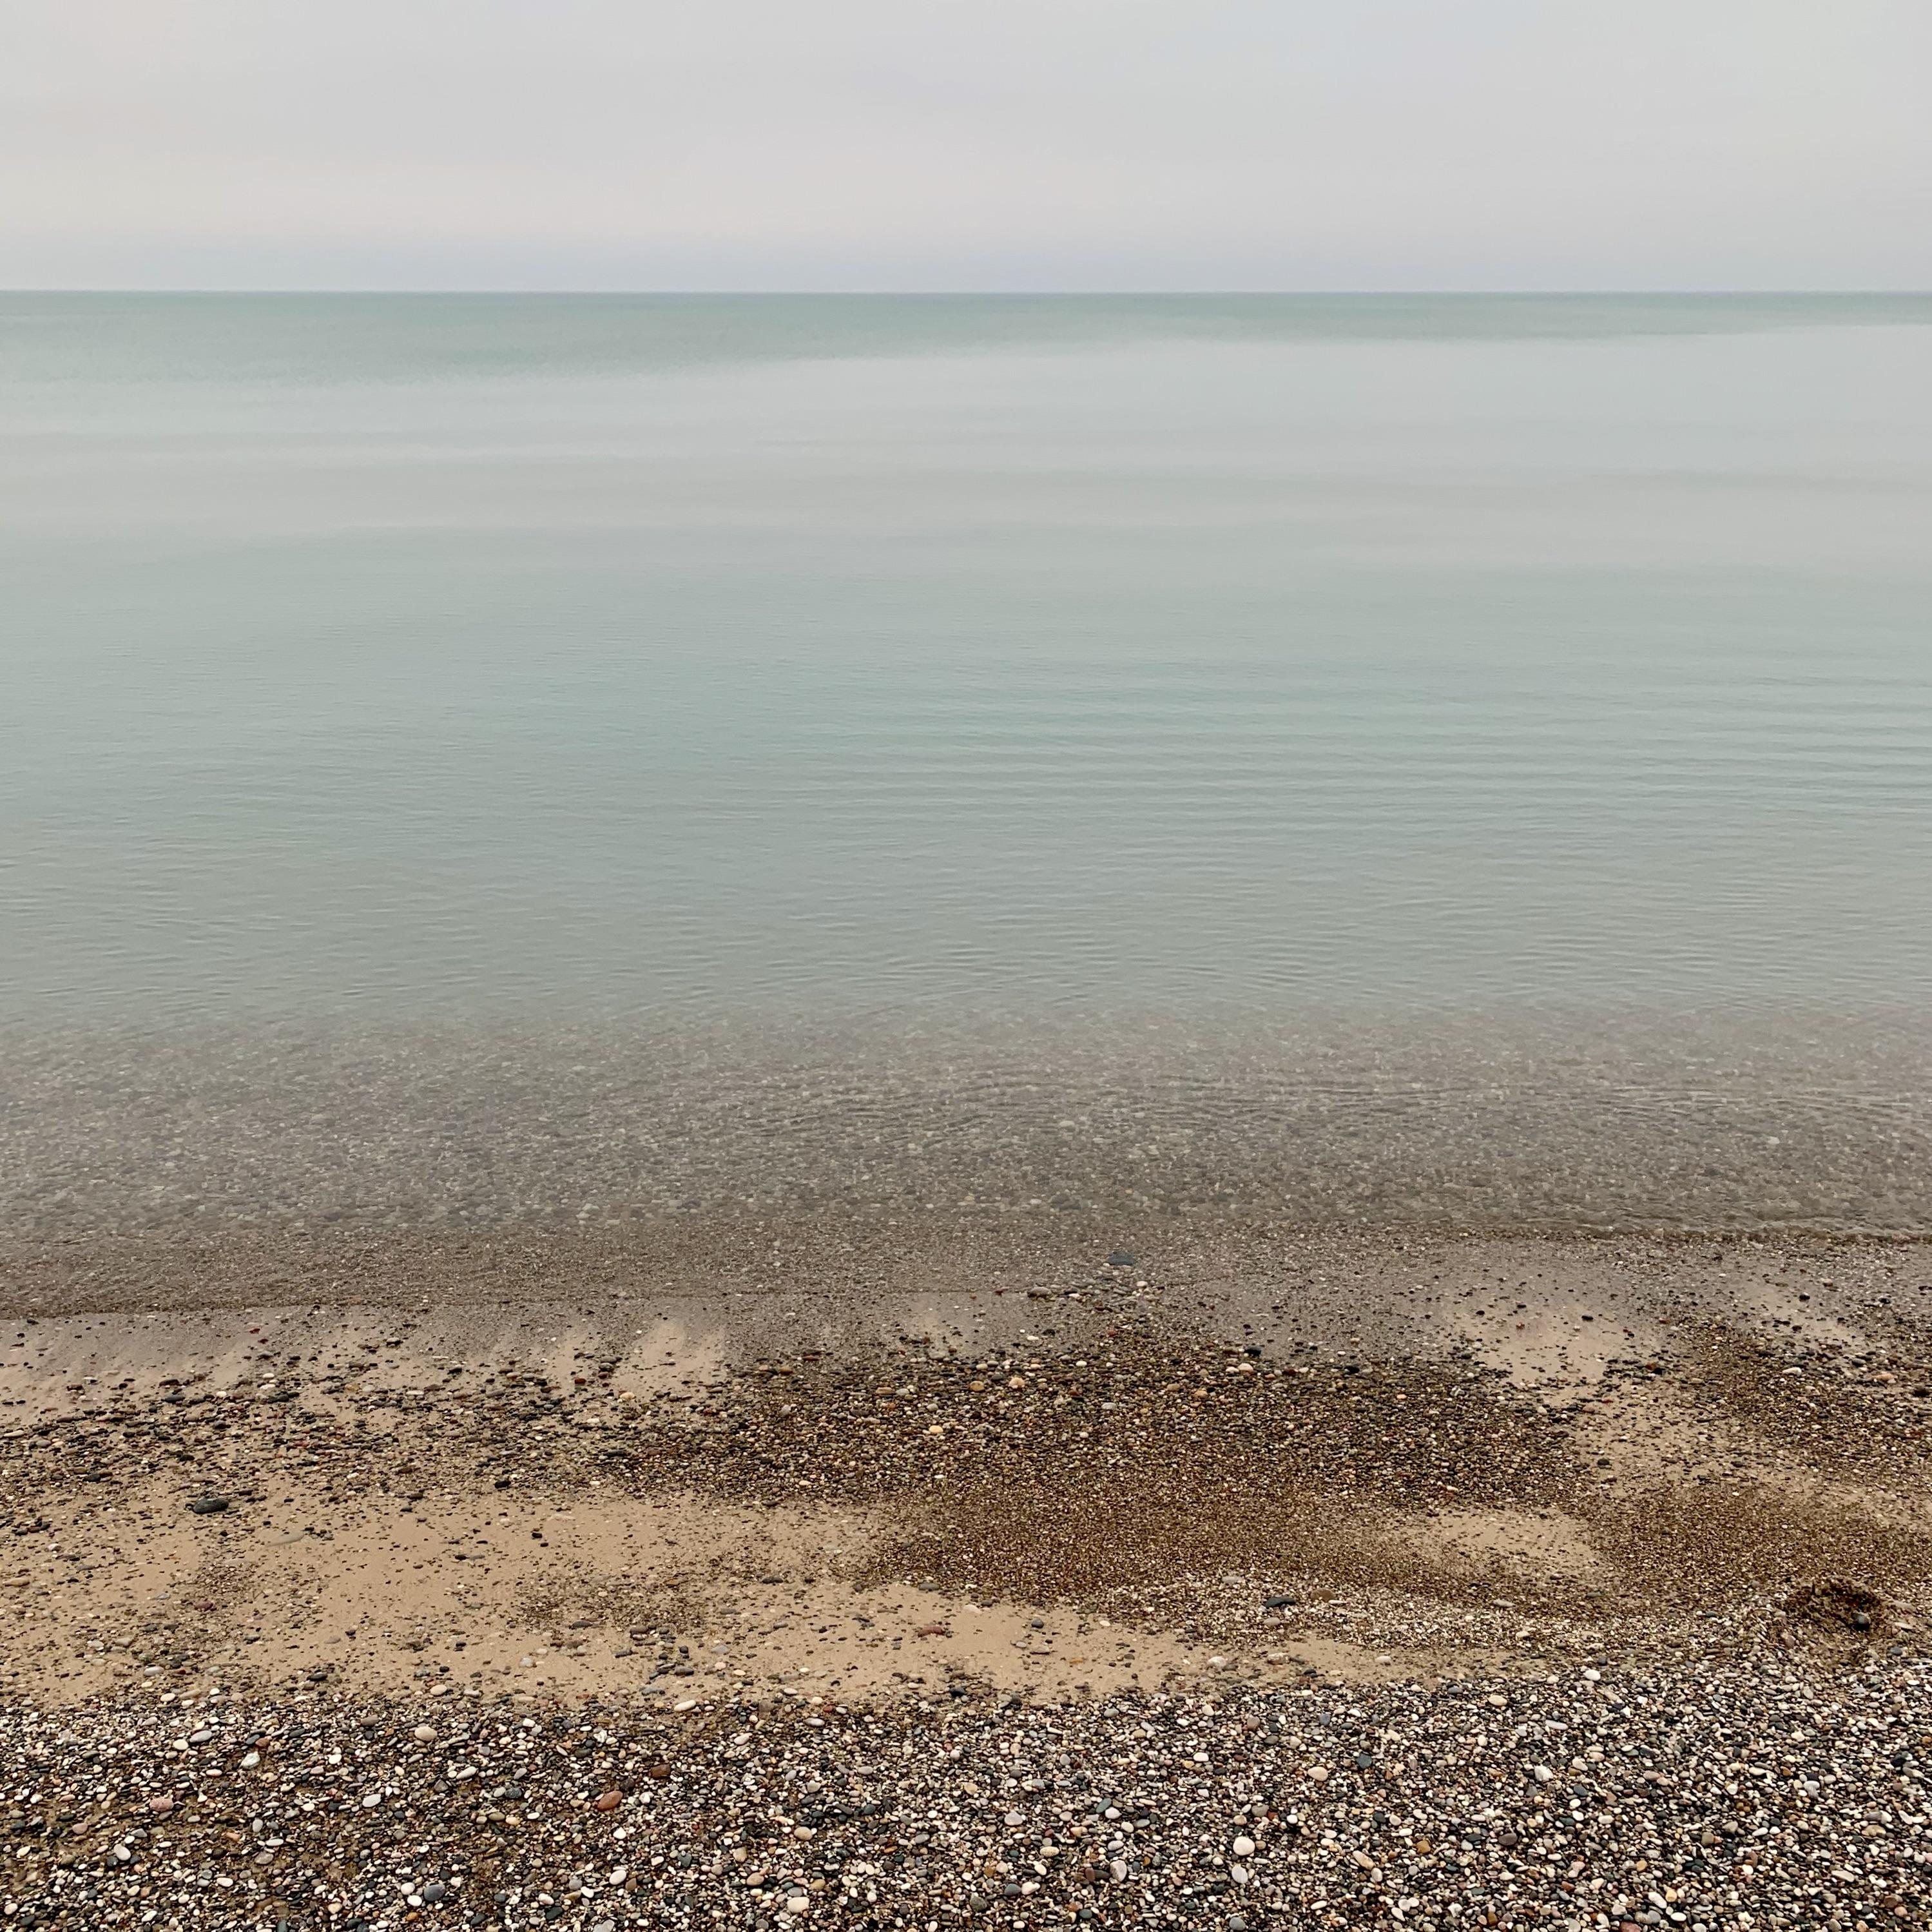 stones, sand, water, horizon, sky